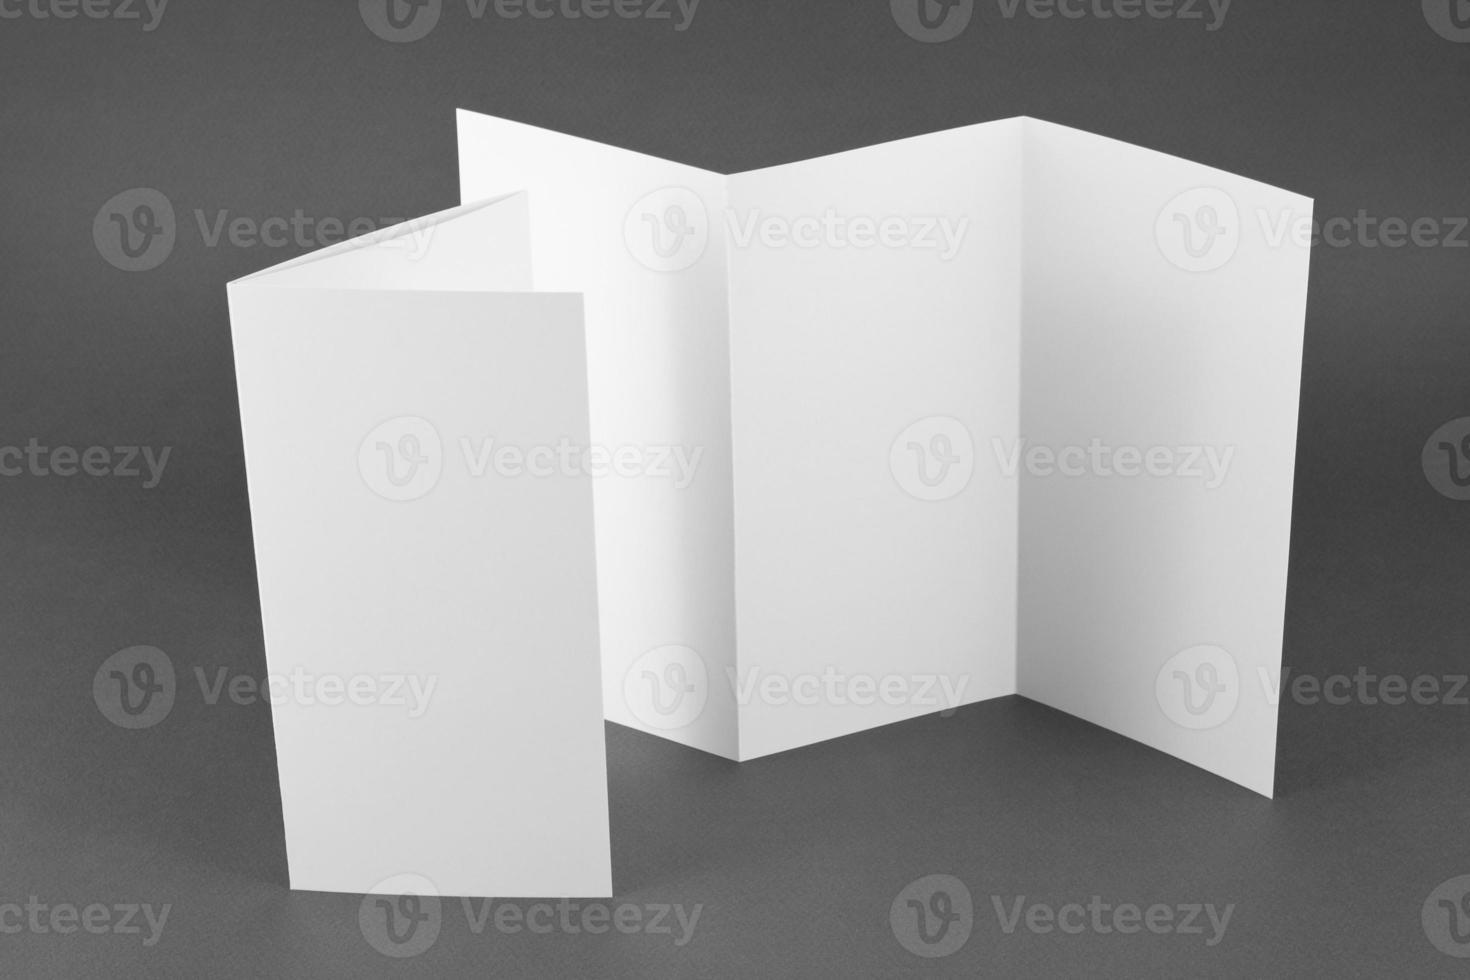 Folleto de página plegable en blanco sobre fondo gris. foto